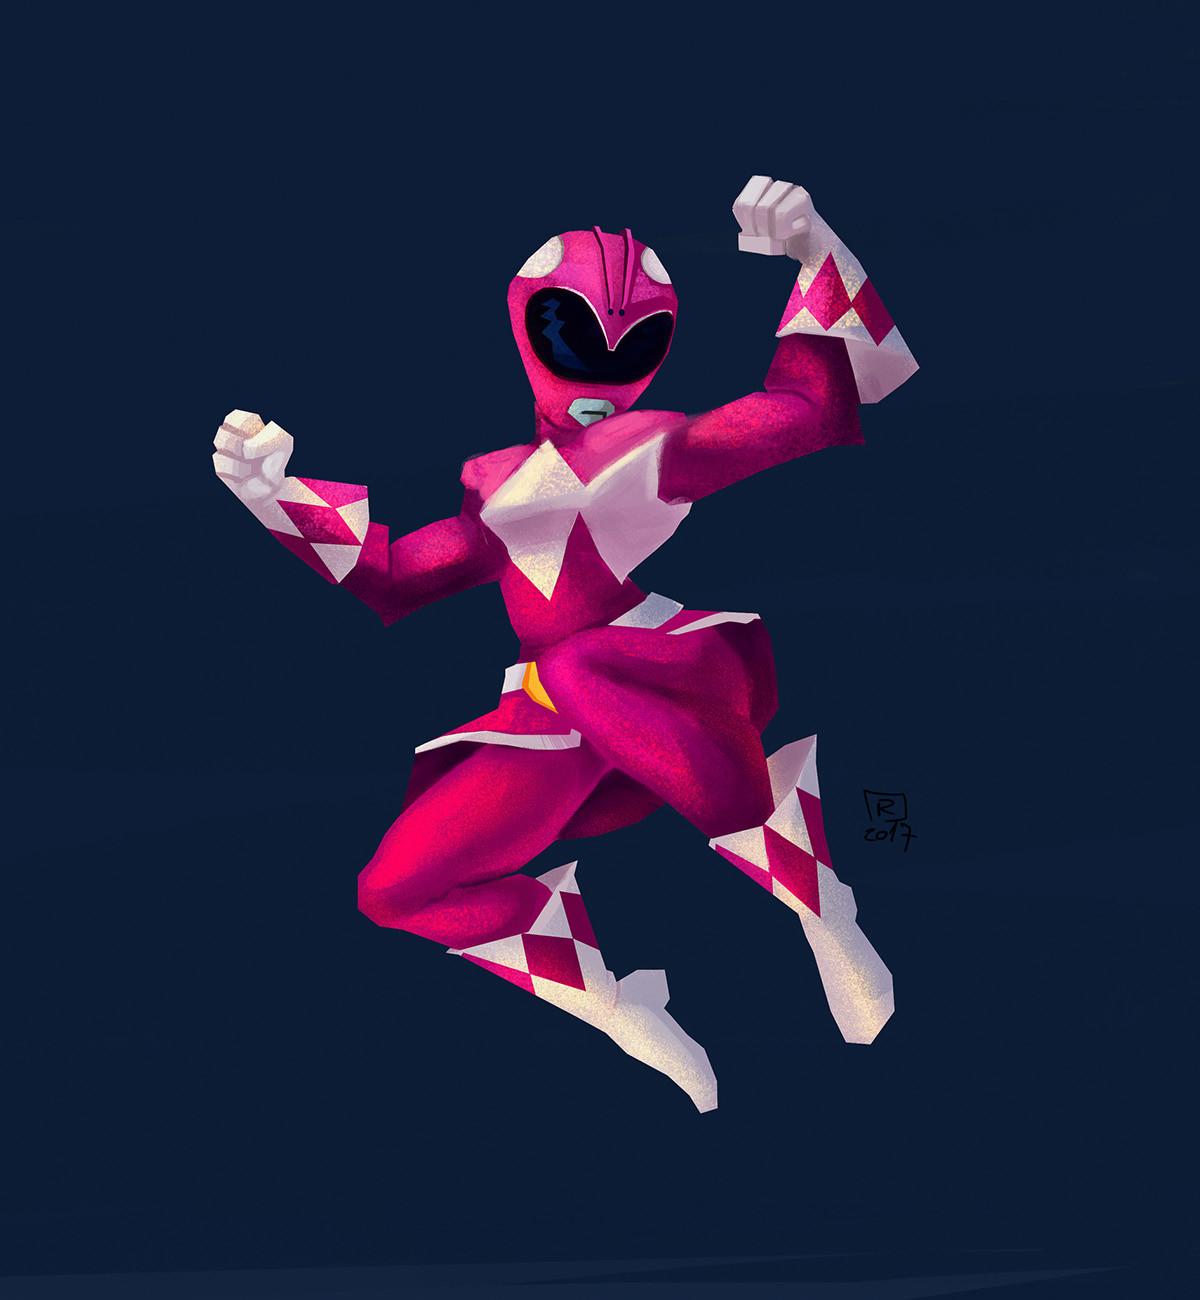 Ramasses romero 201702 12 pinkranger x